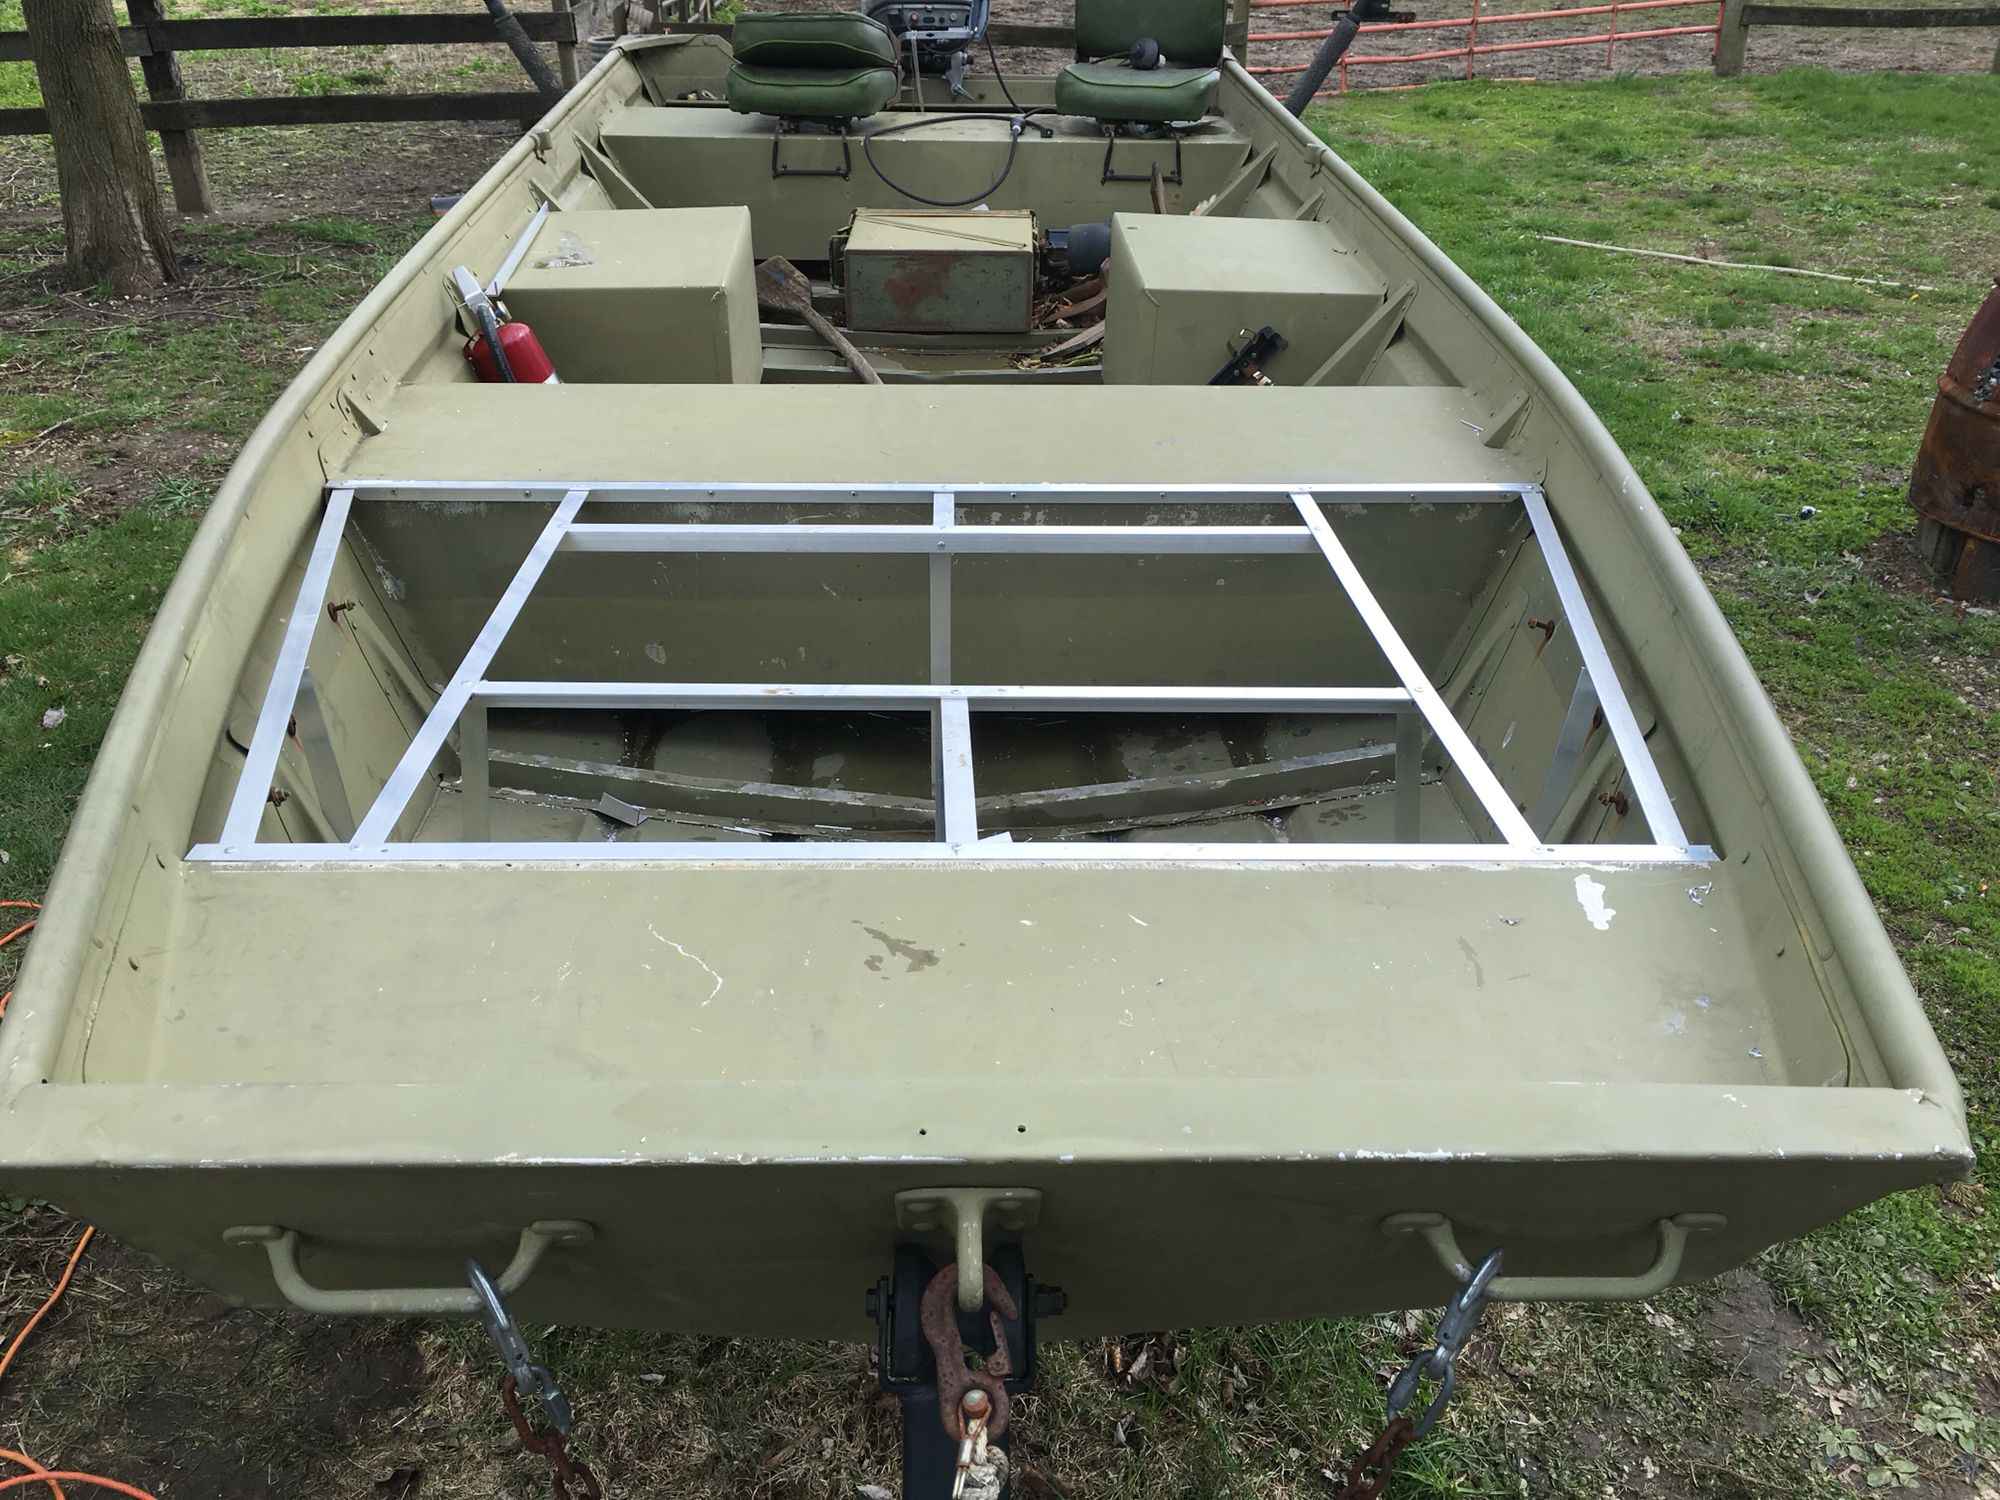 My Jon boat build | Boat stuff | Pinterest | Boat building, Boating ...